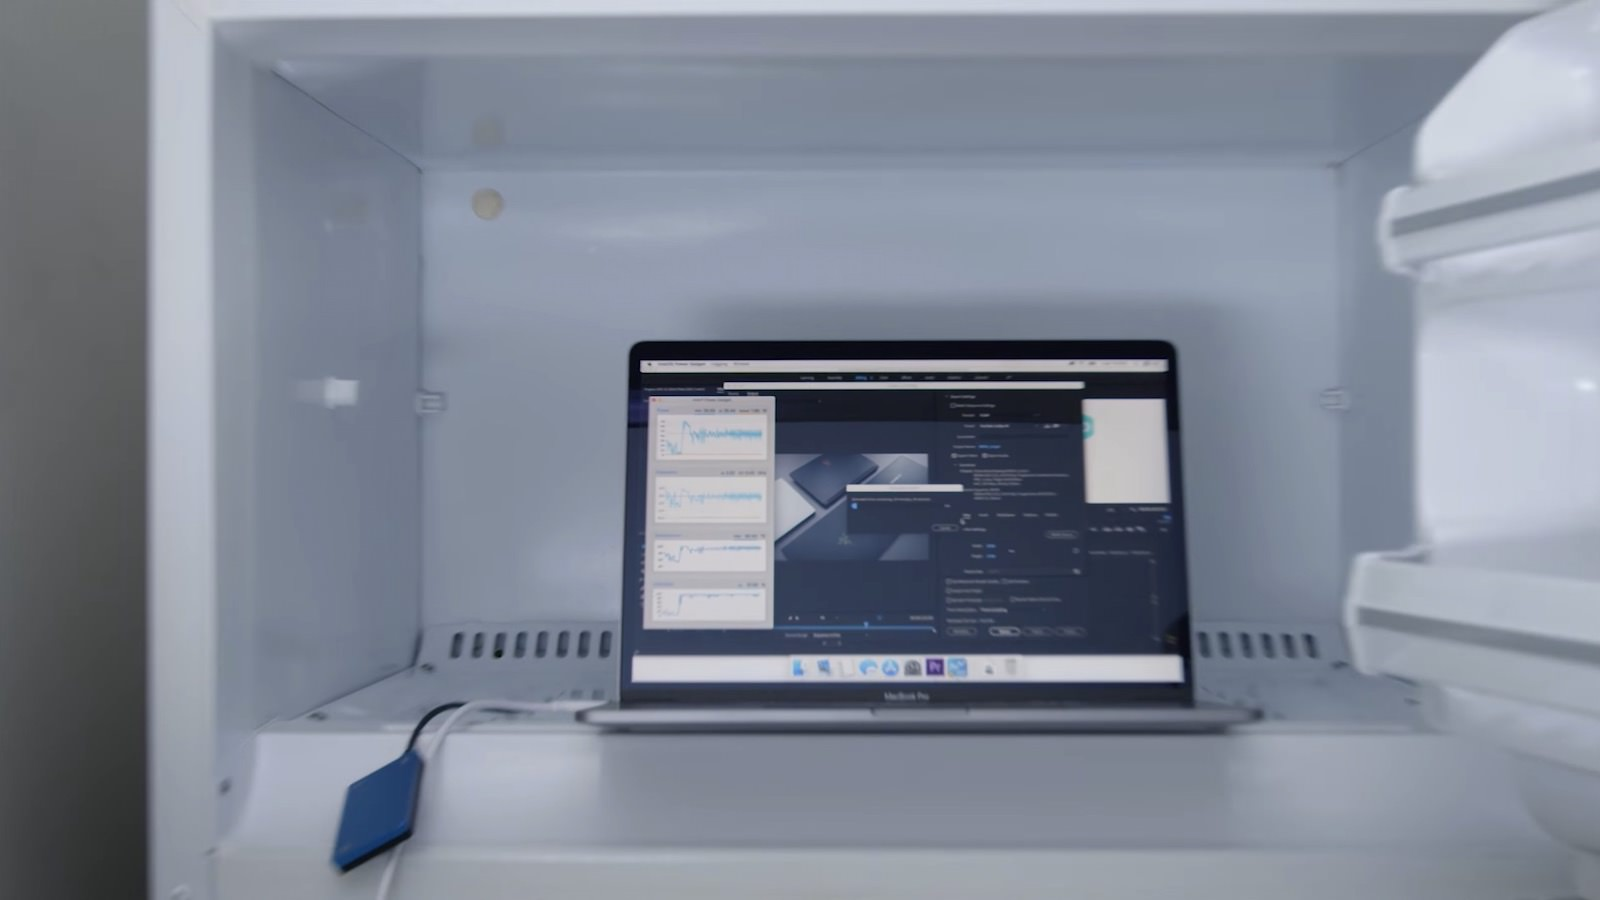 MacBook-Pro-2018-CPU-Throttling-4.jpg